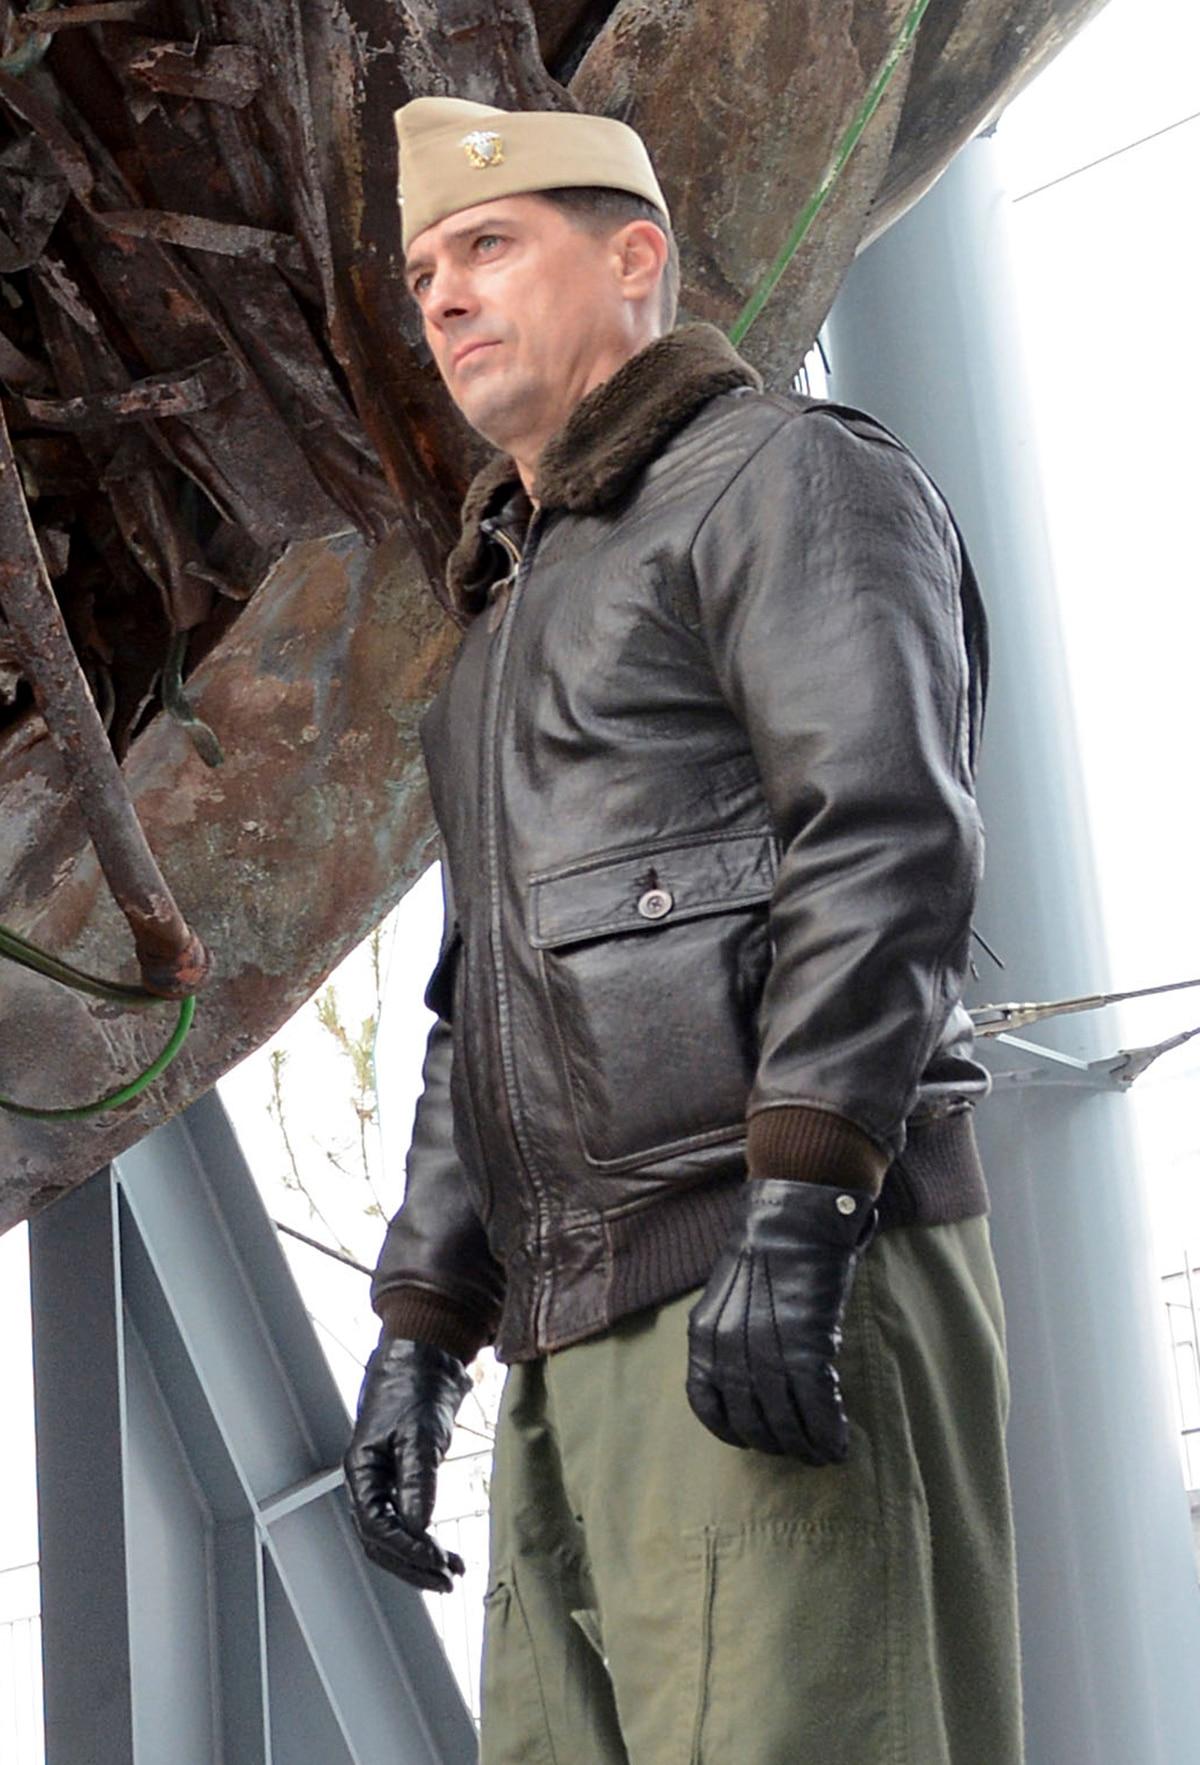 U.S. Navy Cmdr. David Morales